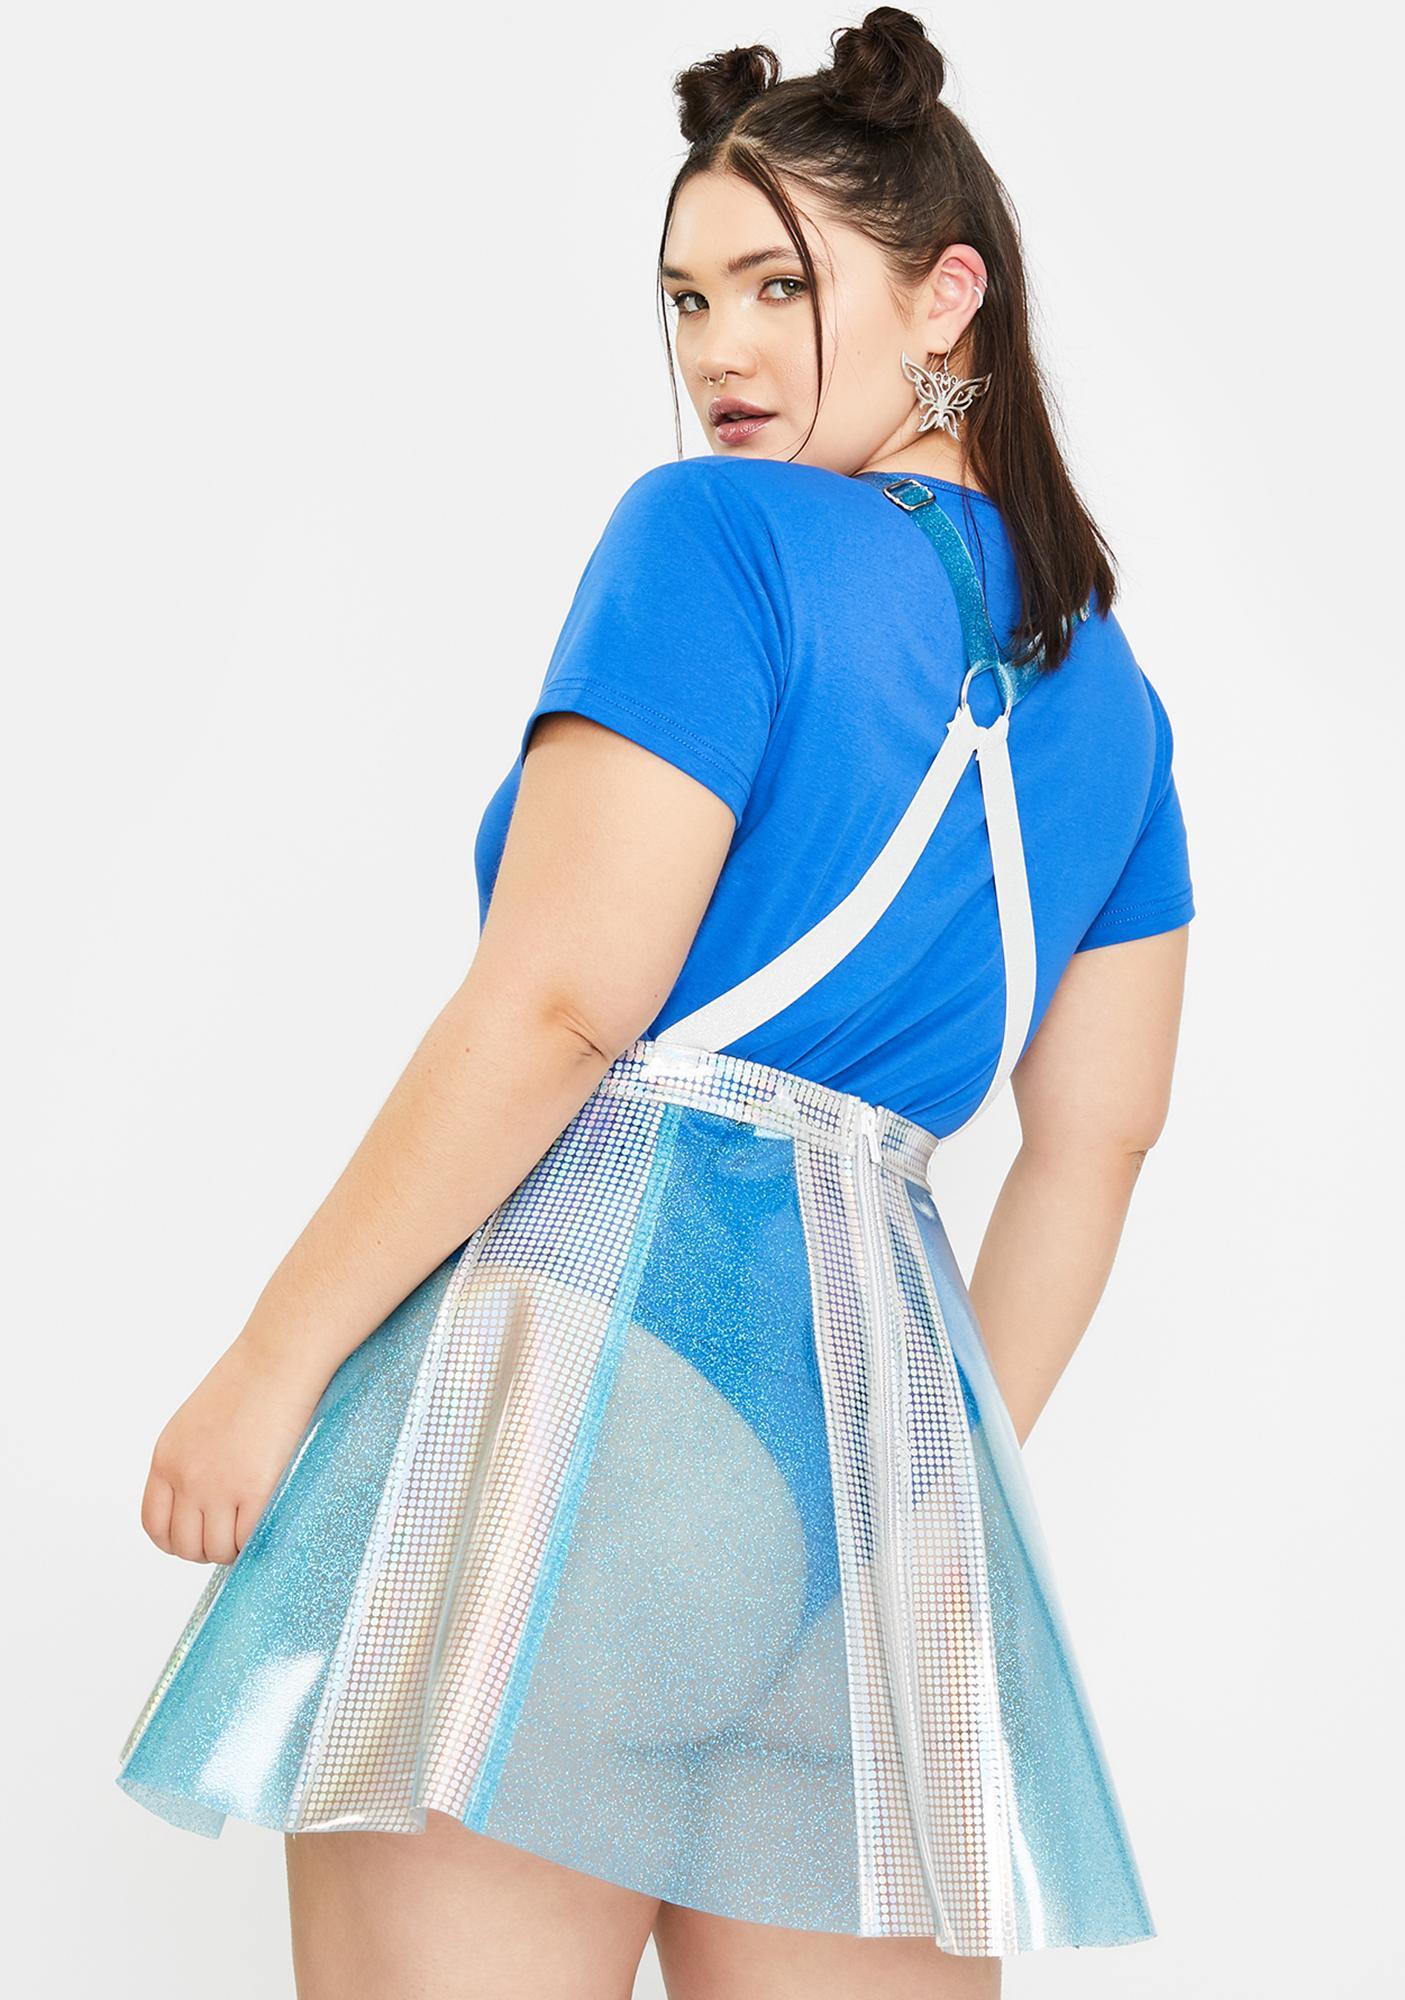 Club Exx Ur Pixie Gurl Hologram Overall Dress